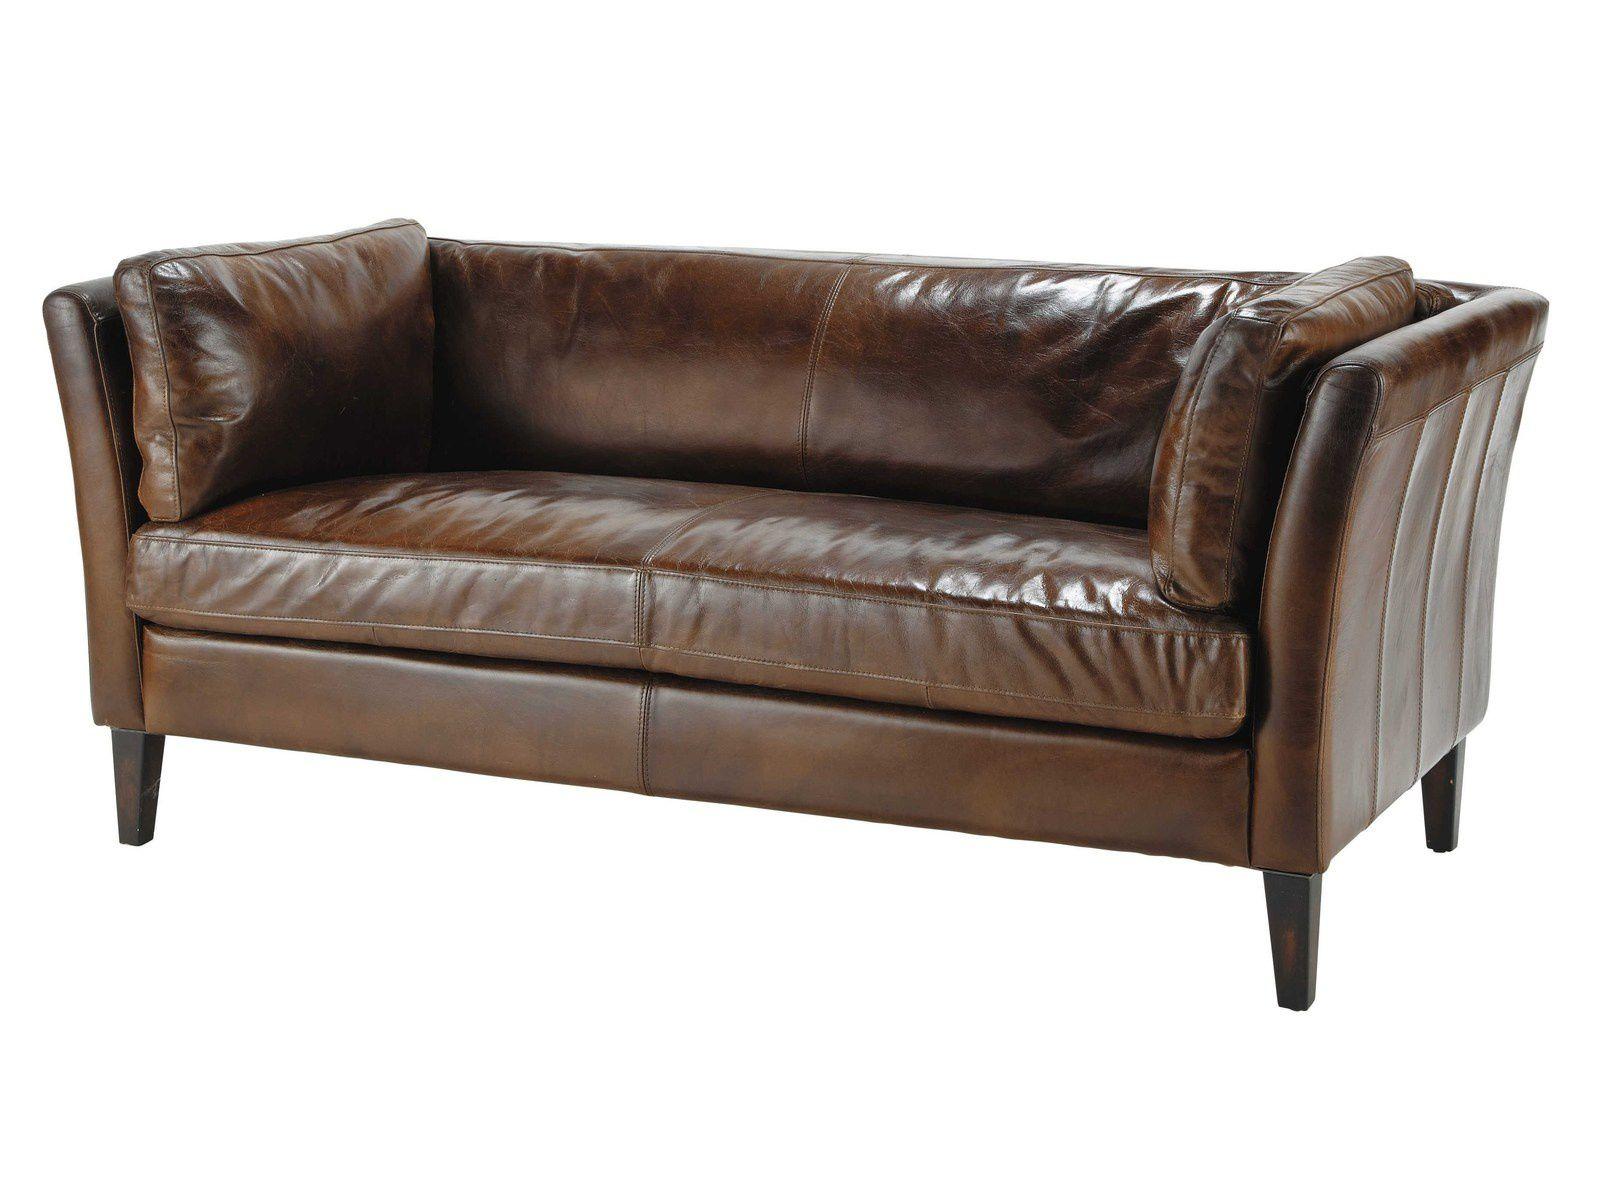 Sélection canapé tissu IKEA... Déco retro vintage club anglais ...